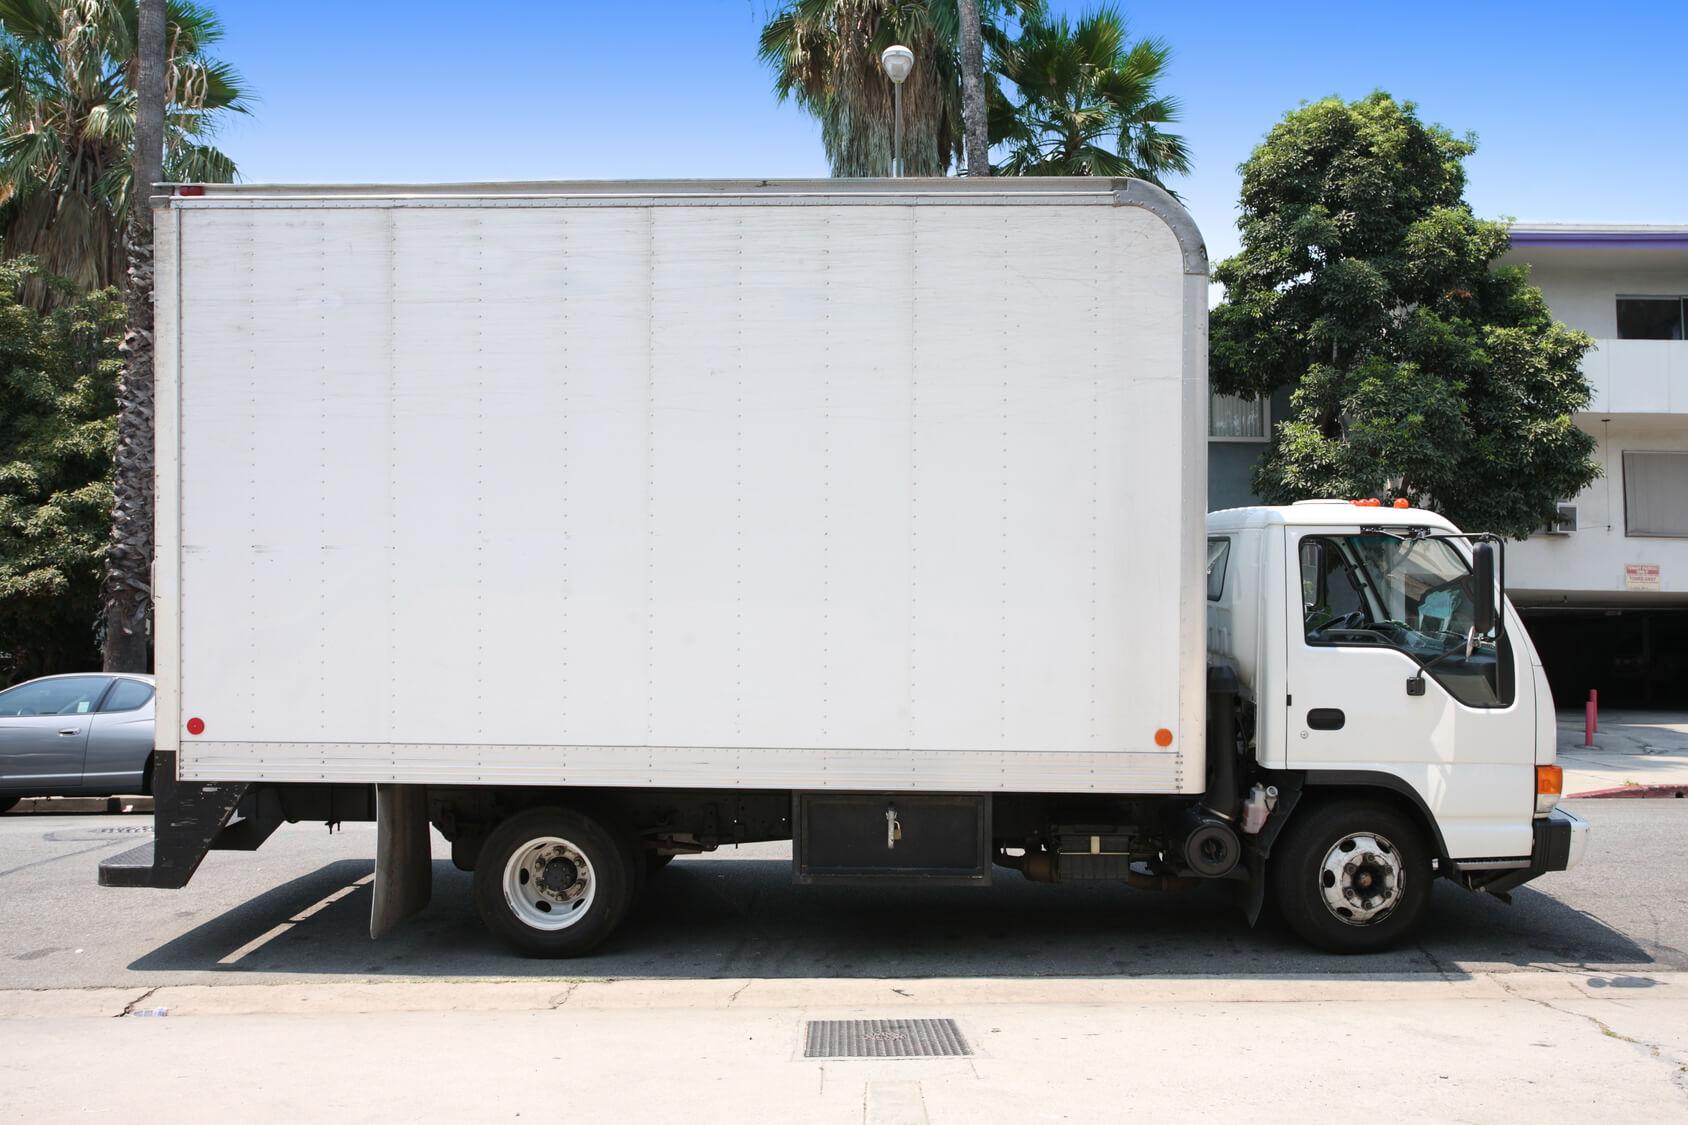 Rental Trucks For Moving >> Box Truck Rental | Moving Trucks | Affordable Rental | New Holland, PA